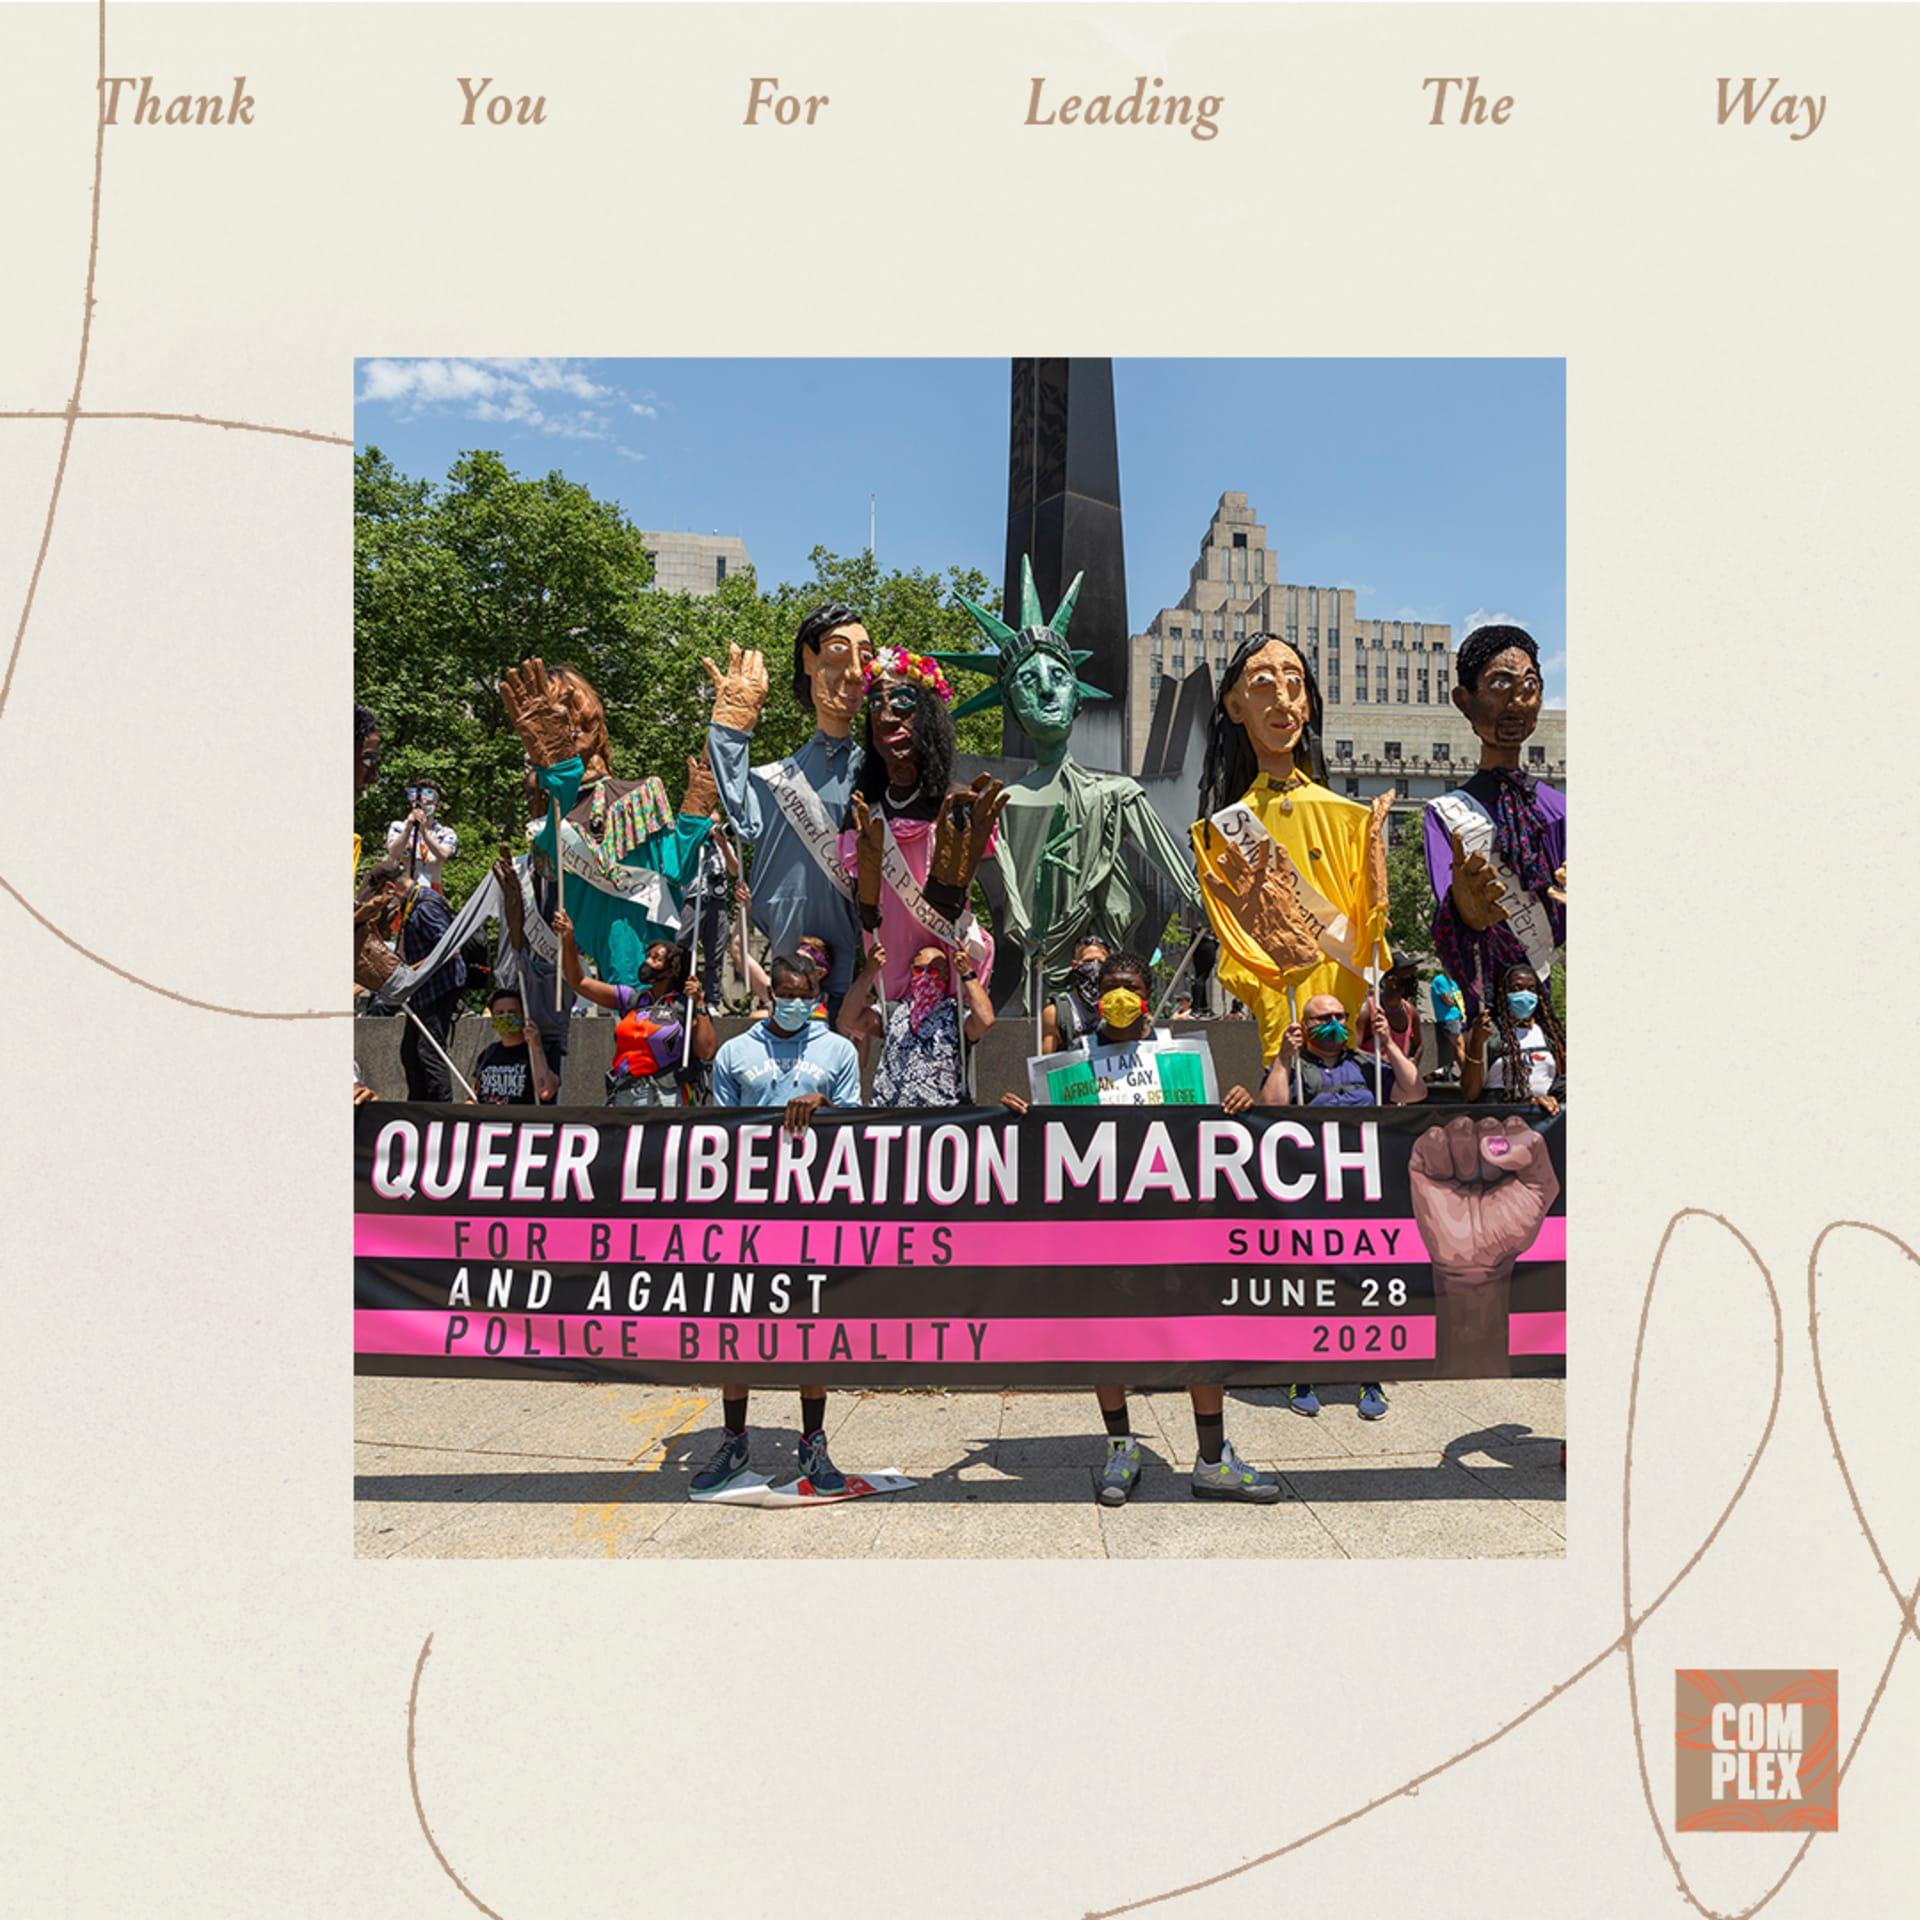 William Dorsey Swann, Queer Liberation